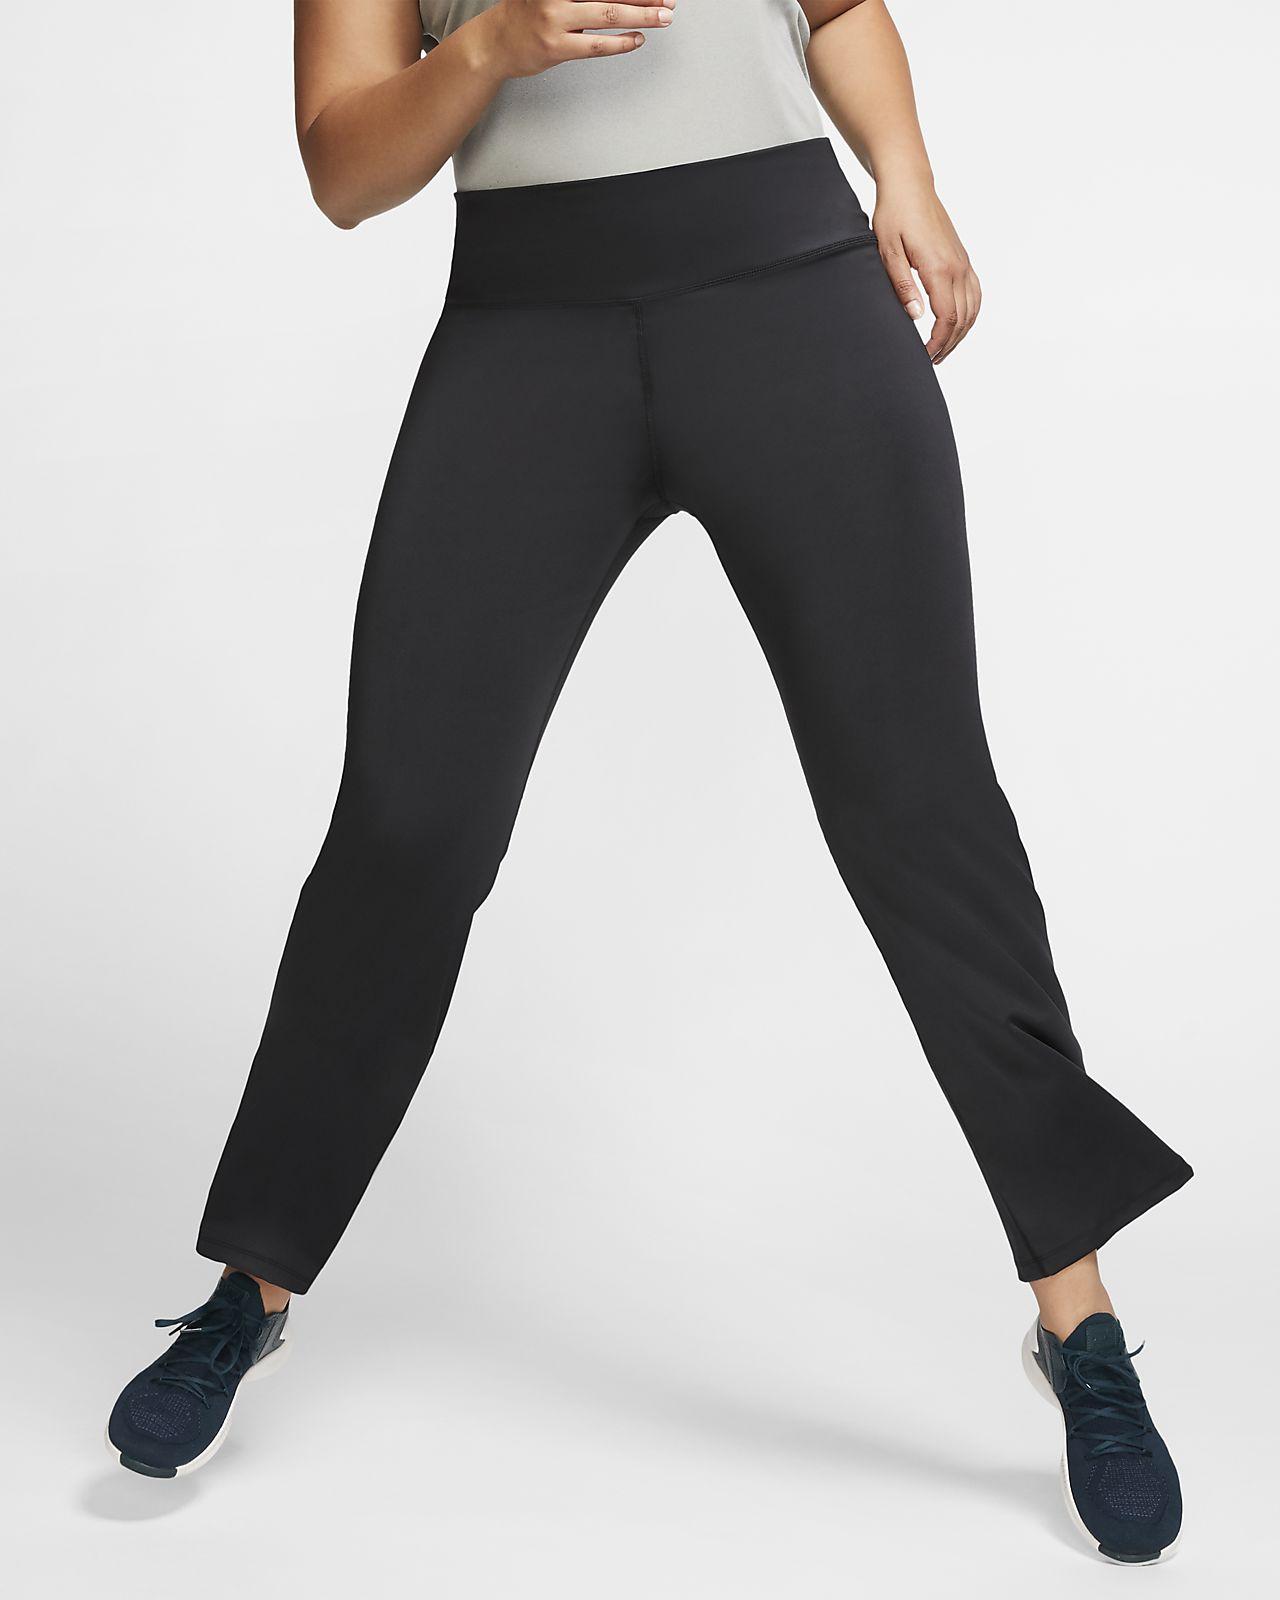 Nike Power Damen-Trainingshose (große Größe)